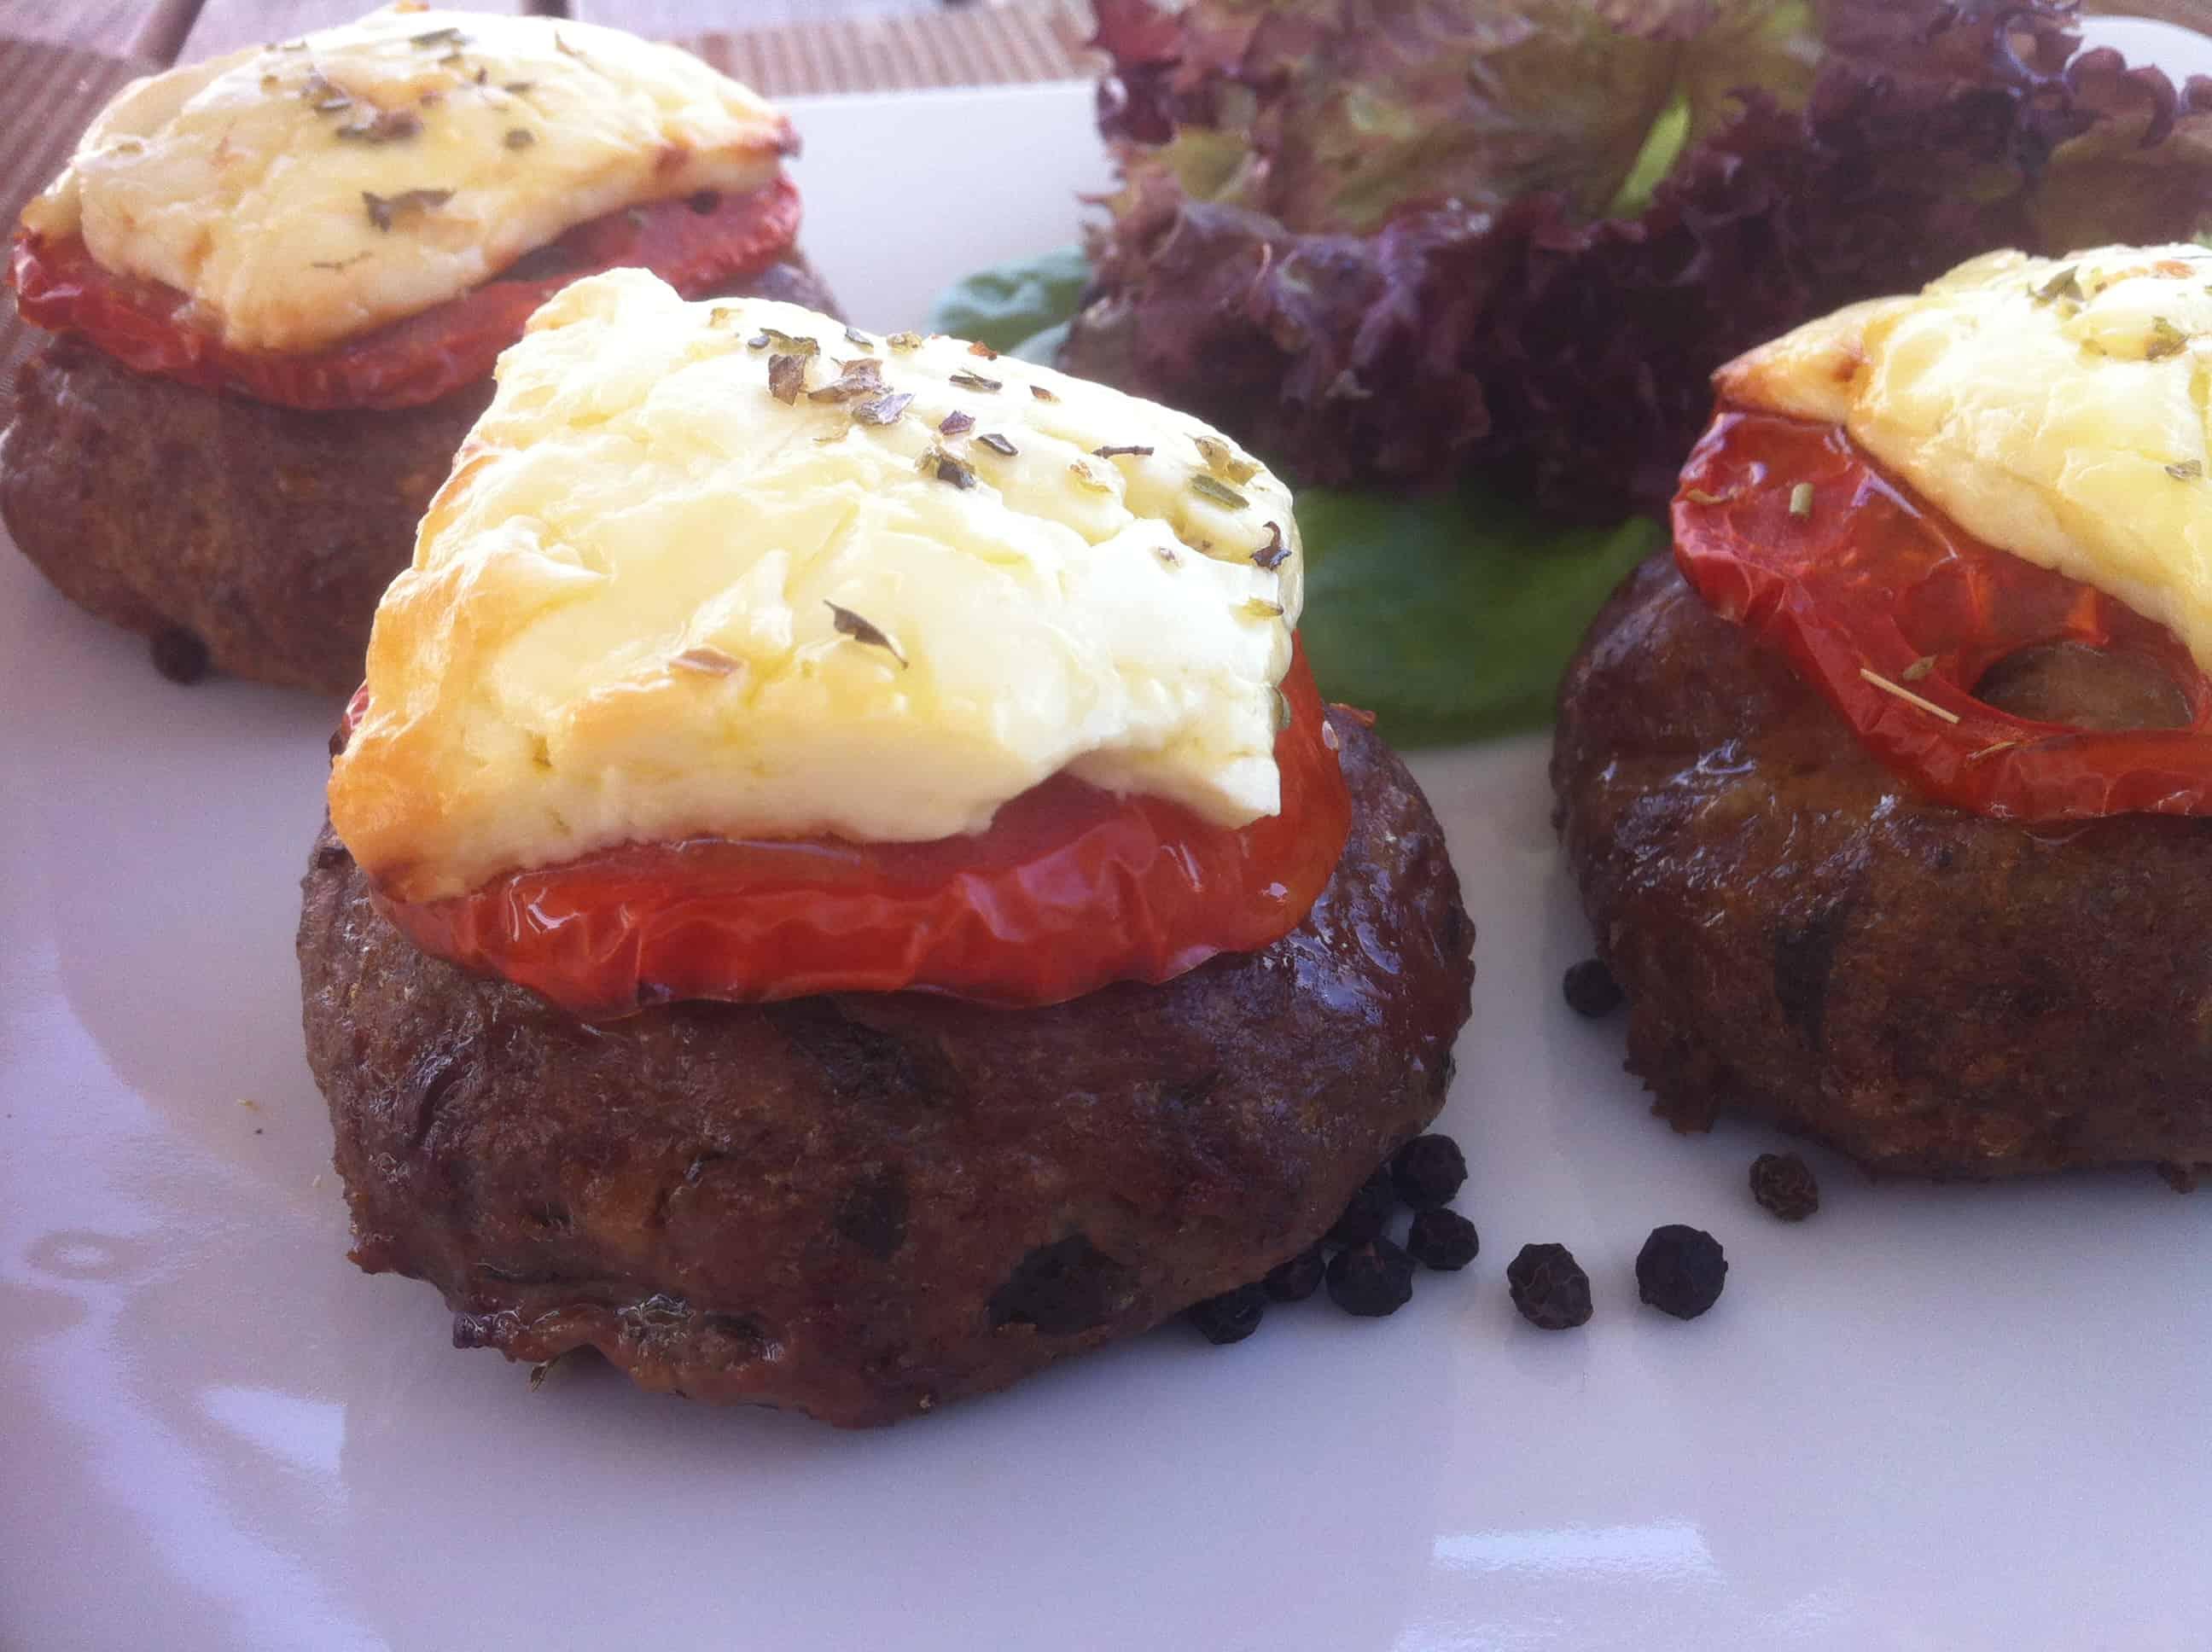 Greek Bifteki (Burger) with Feta cheese - My Greek Dish